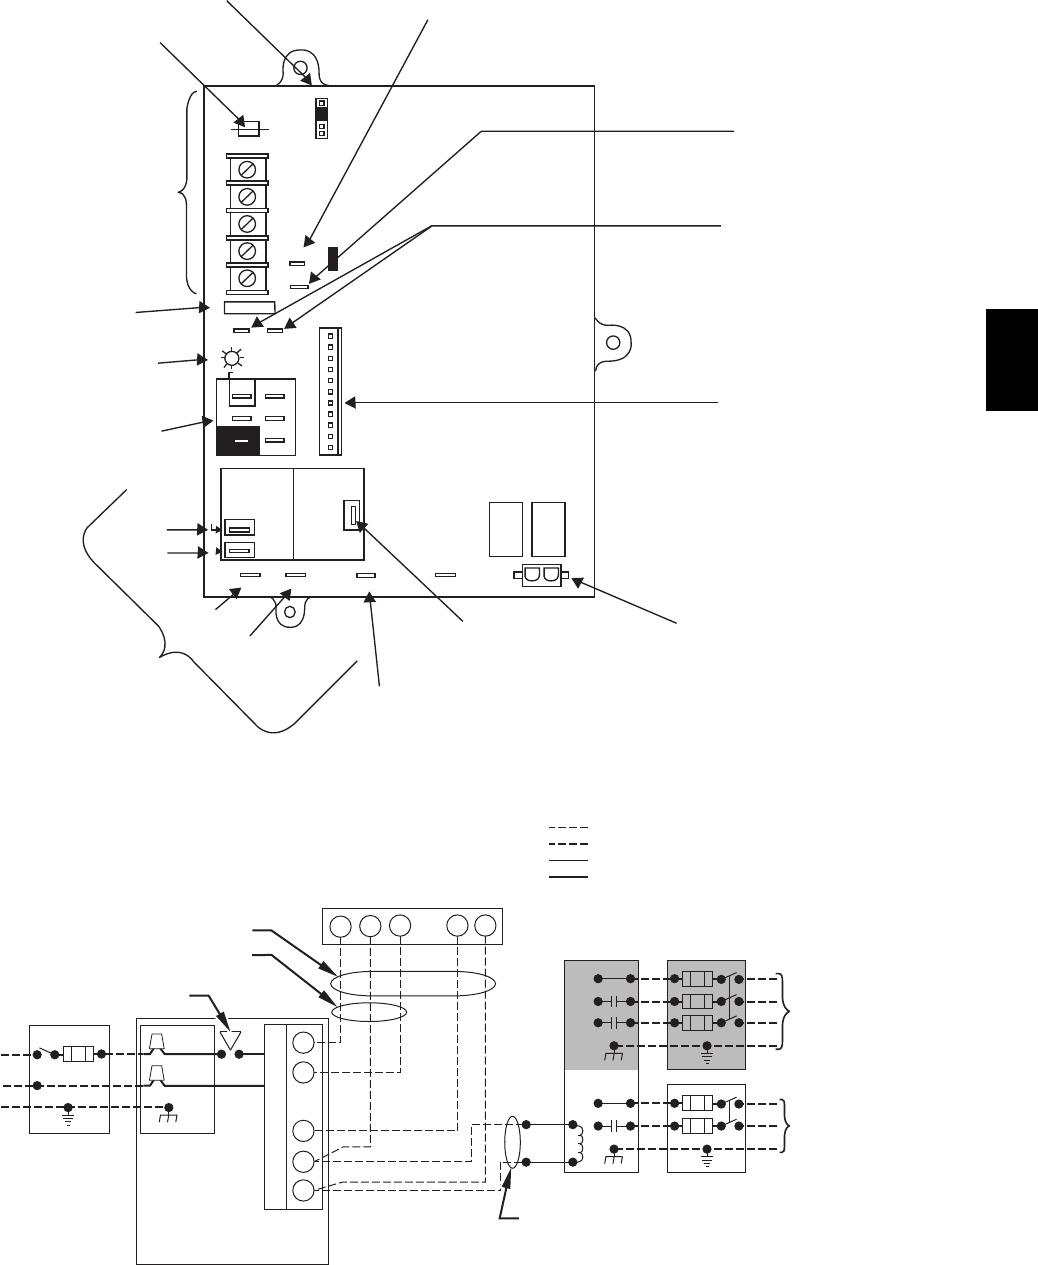 Bryant Furnace Bryant Furnace Diagram